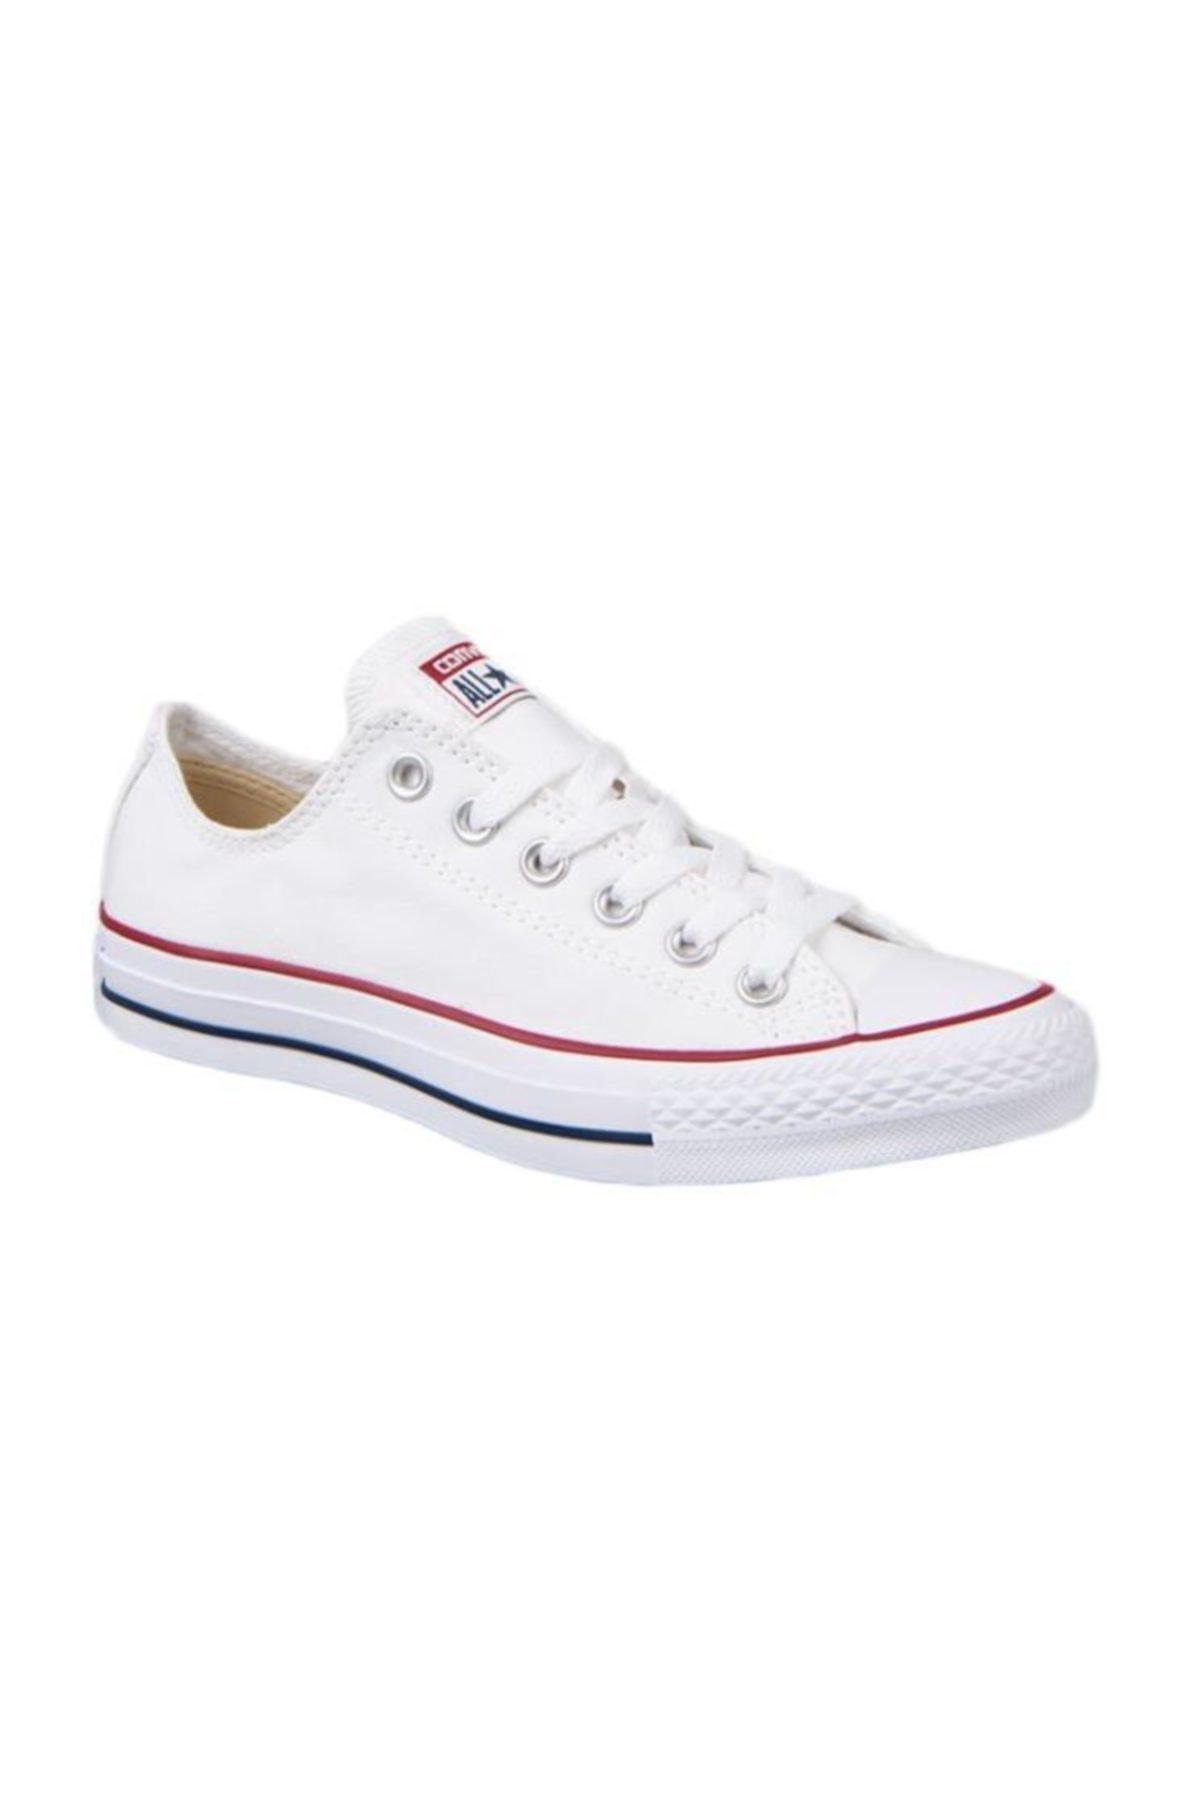 converse Chuck Taylor All Star Ayakkabı Beyaz Renk - M7652c 1